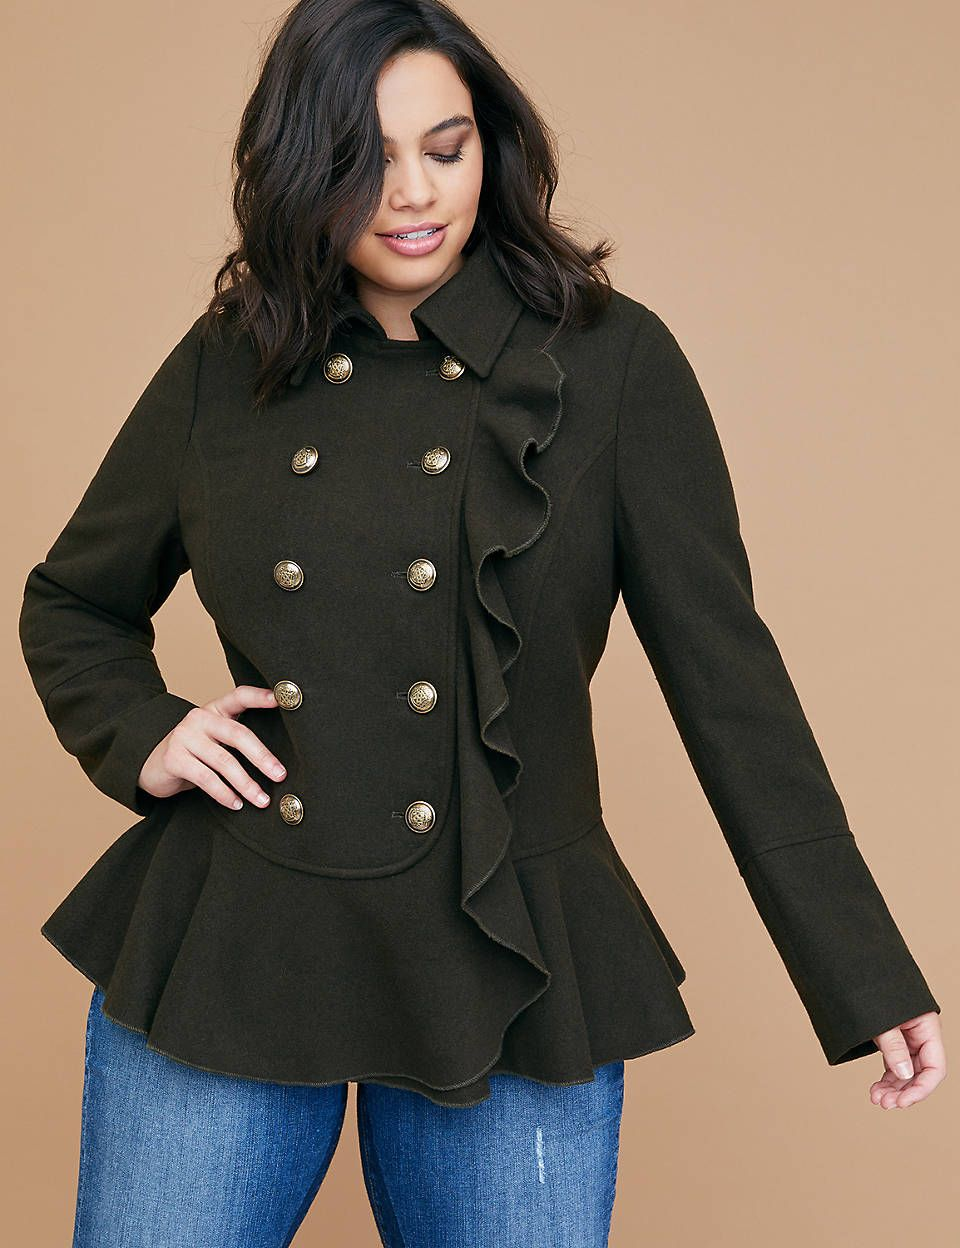 Military Wool Peplum Coat With Ruffle Peplum Coat Coat Plus Size Outerwear [ 1248 x 960 Pixel ]